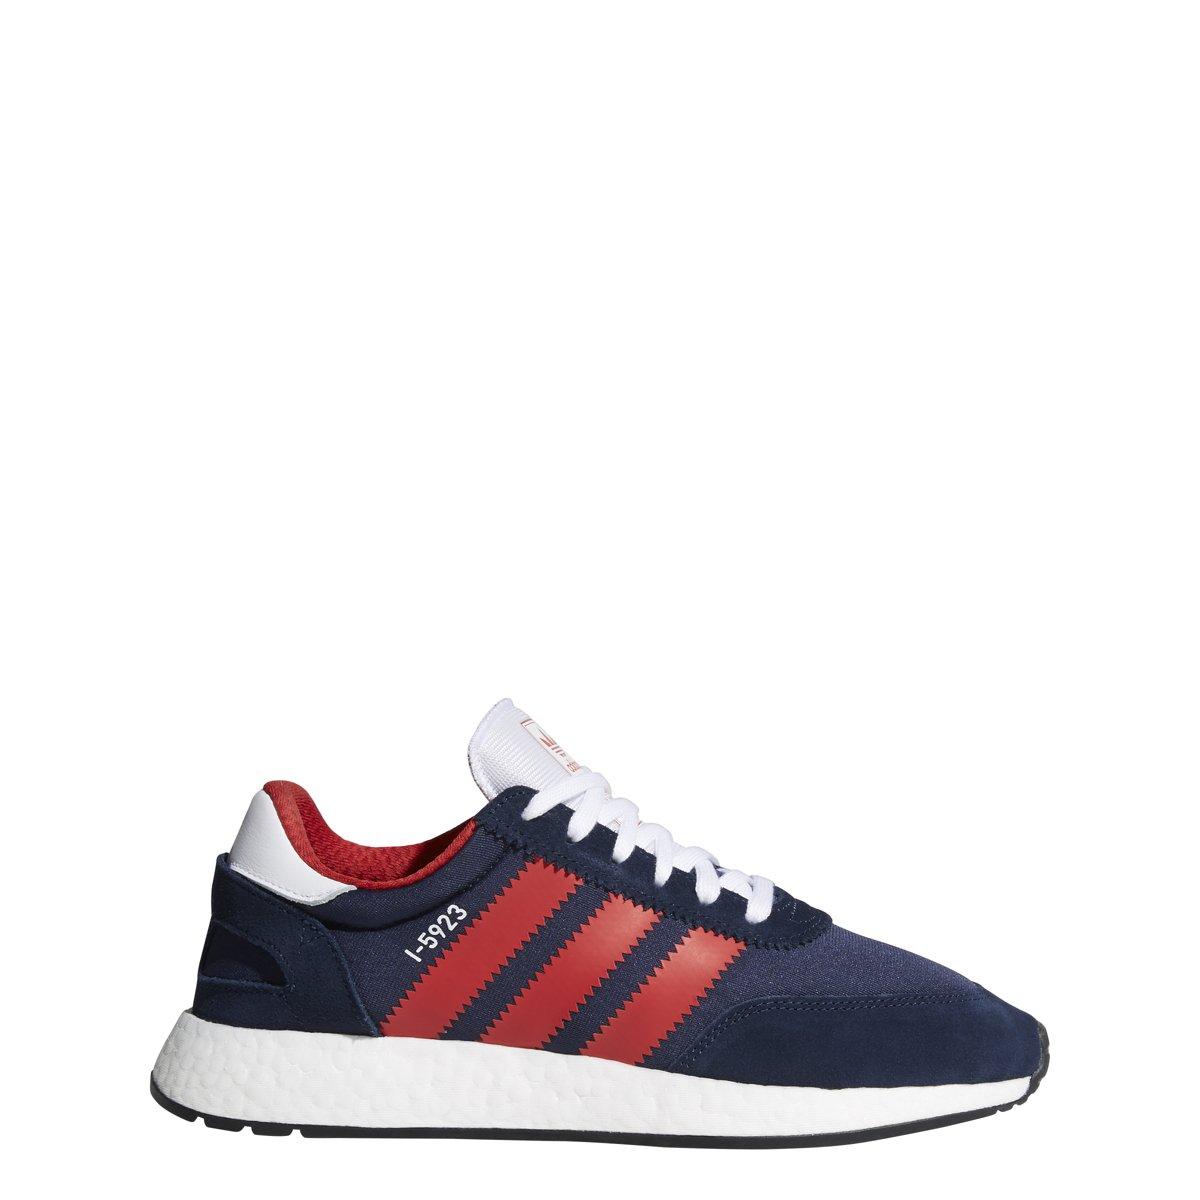 adidas Originals I 5923 Shoe Men's Casual